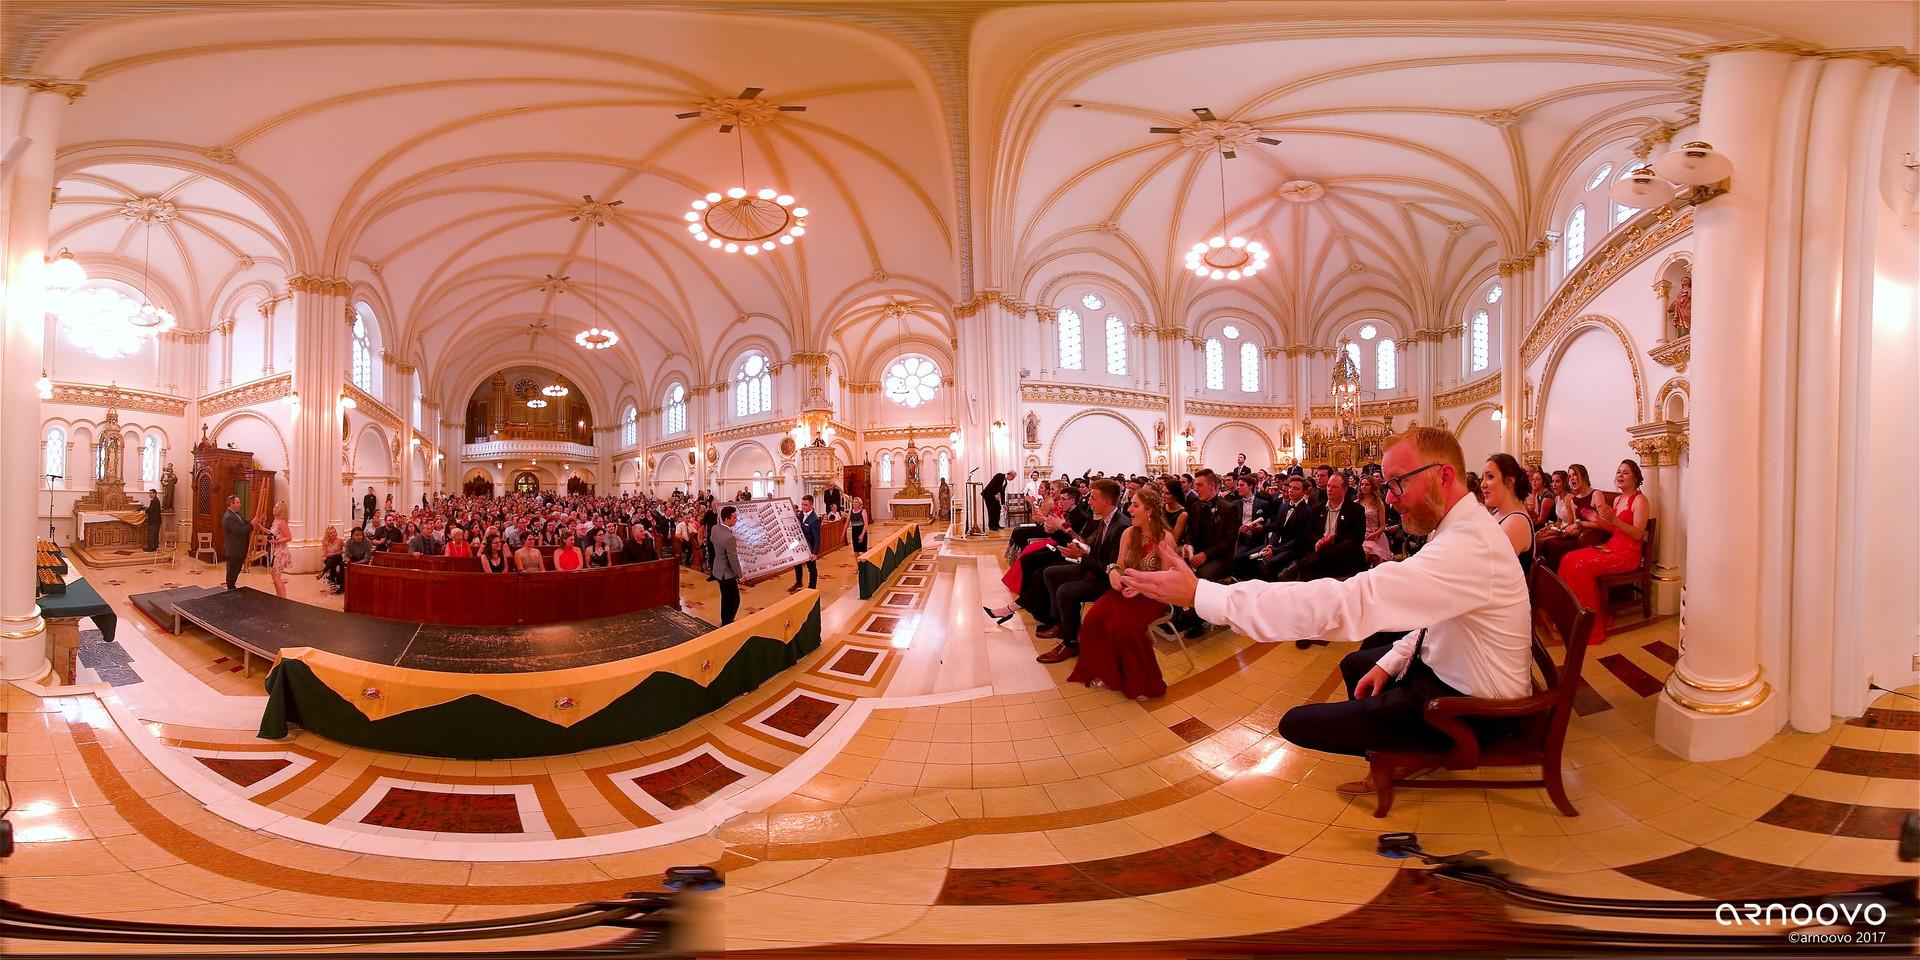 GRADUATION CEREMONY: SÉMINAIRE SAINT-JOSEPH | Chapel of the Séminaire Saint-Joseph, Trois-Rivières (QC)